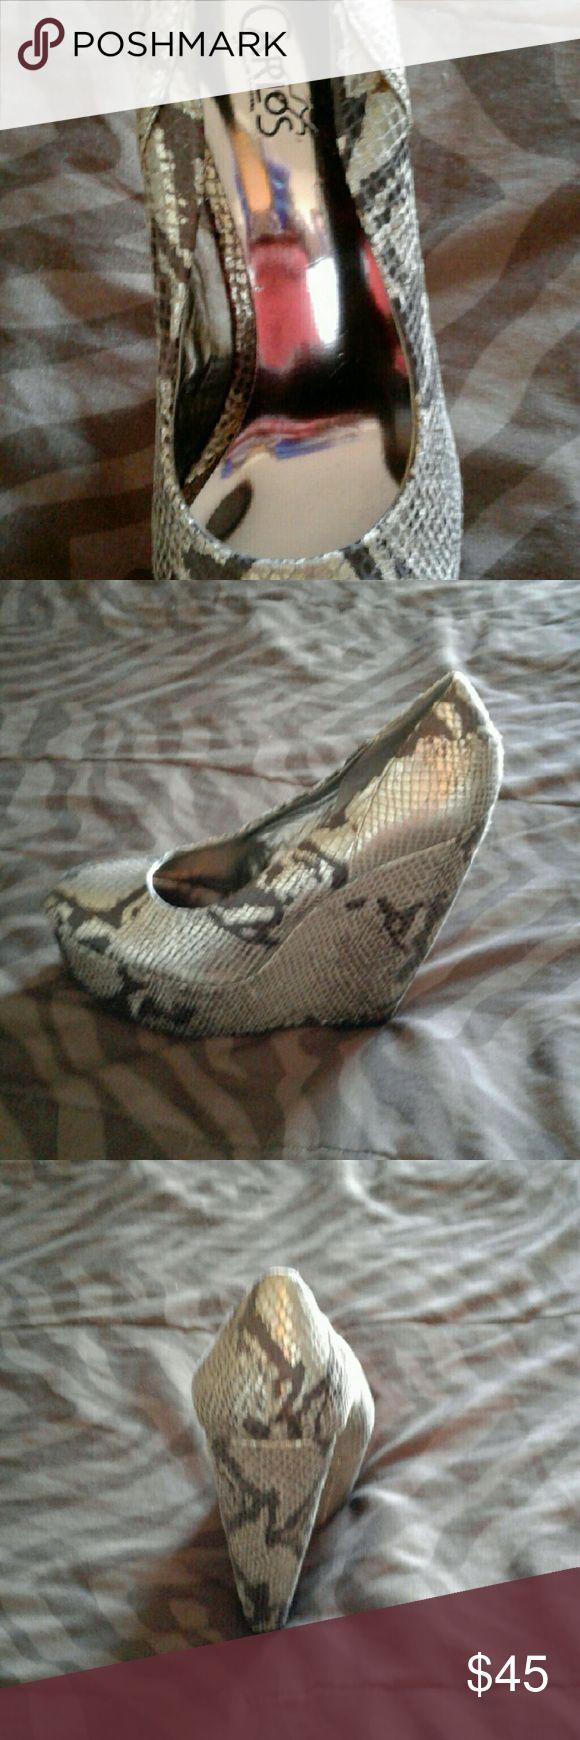 Carlos Santana silver/black  python wedges New Carlos Santana wedges Carlos Santana Shoes Wedges